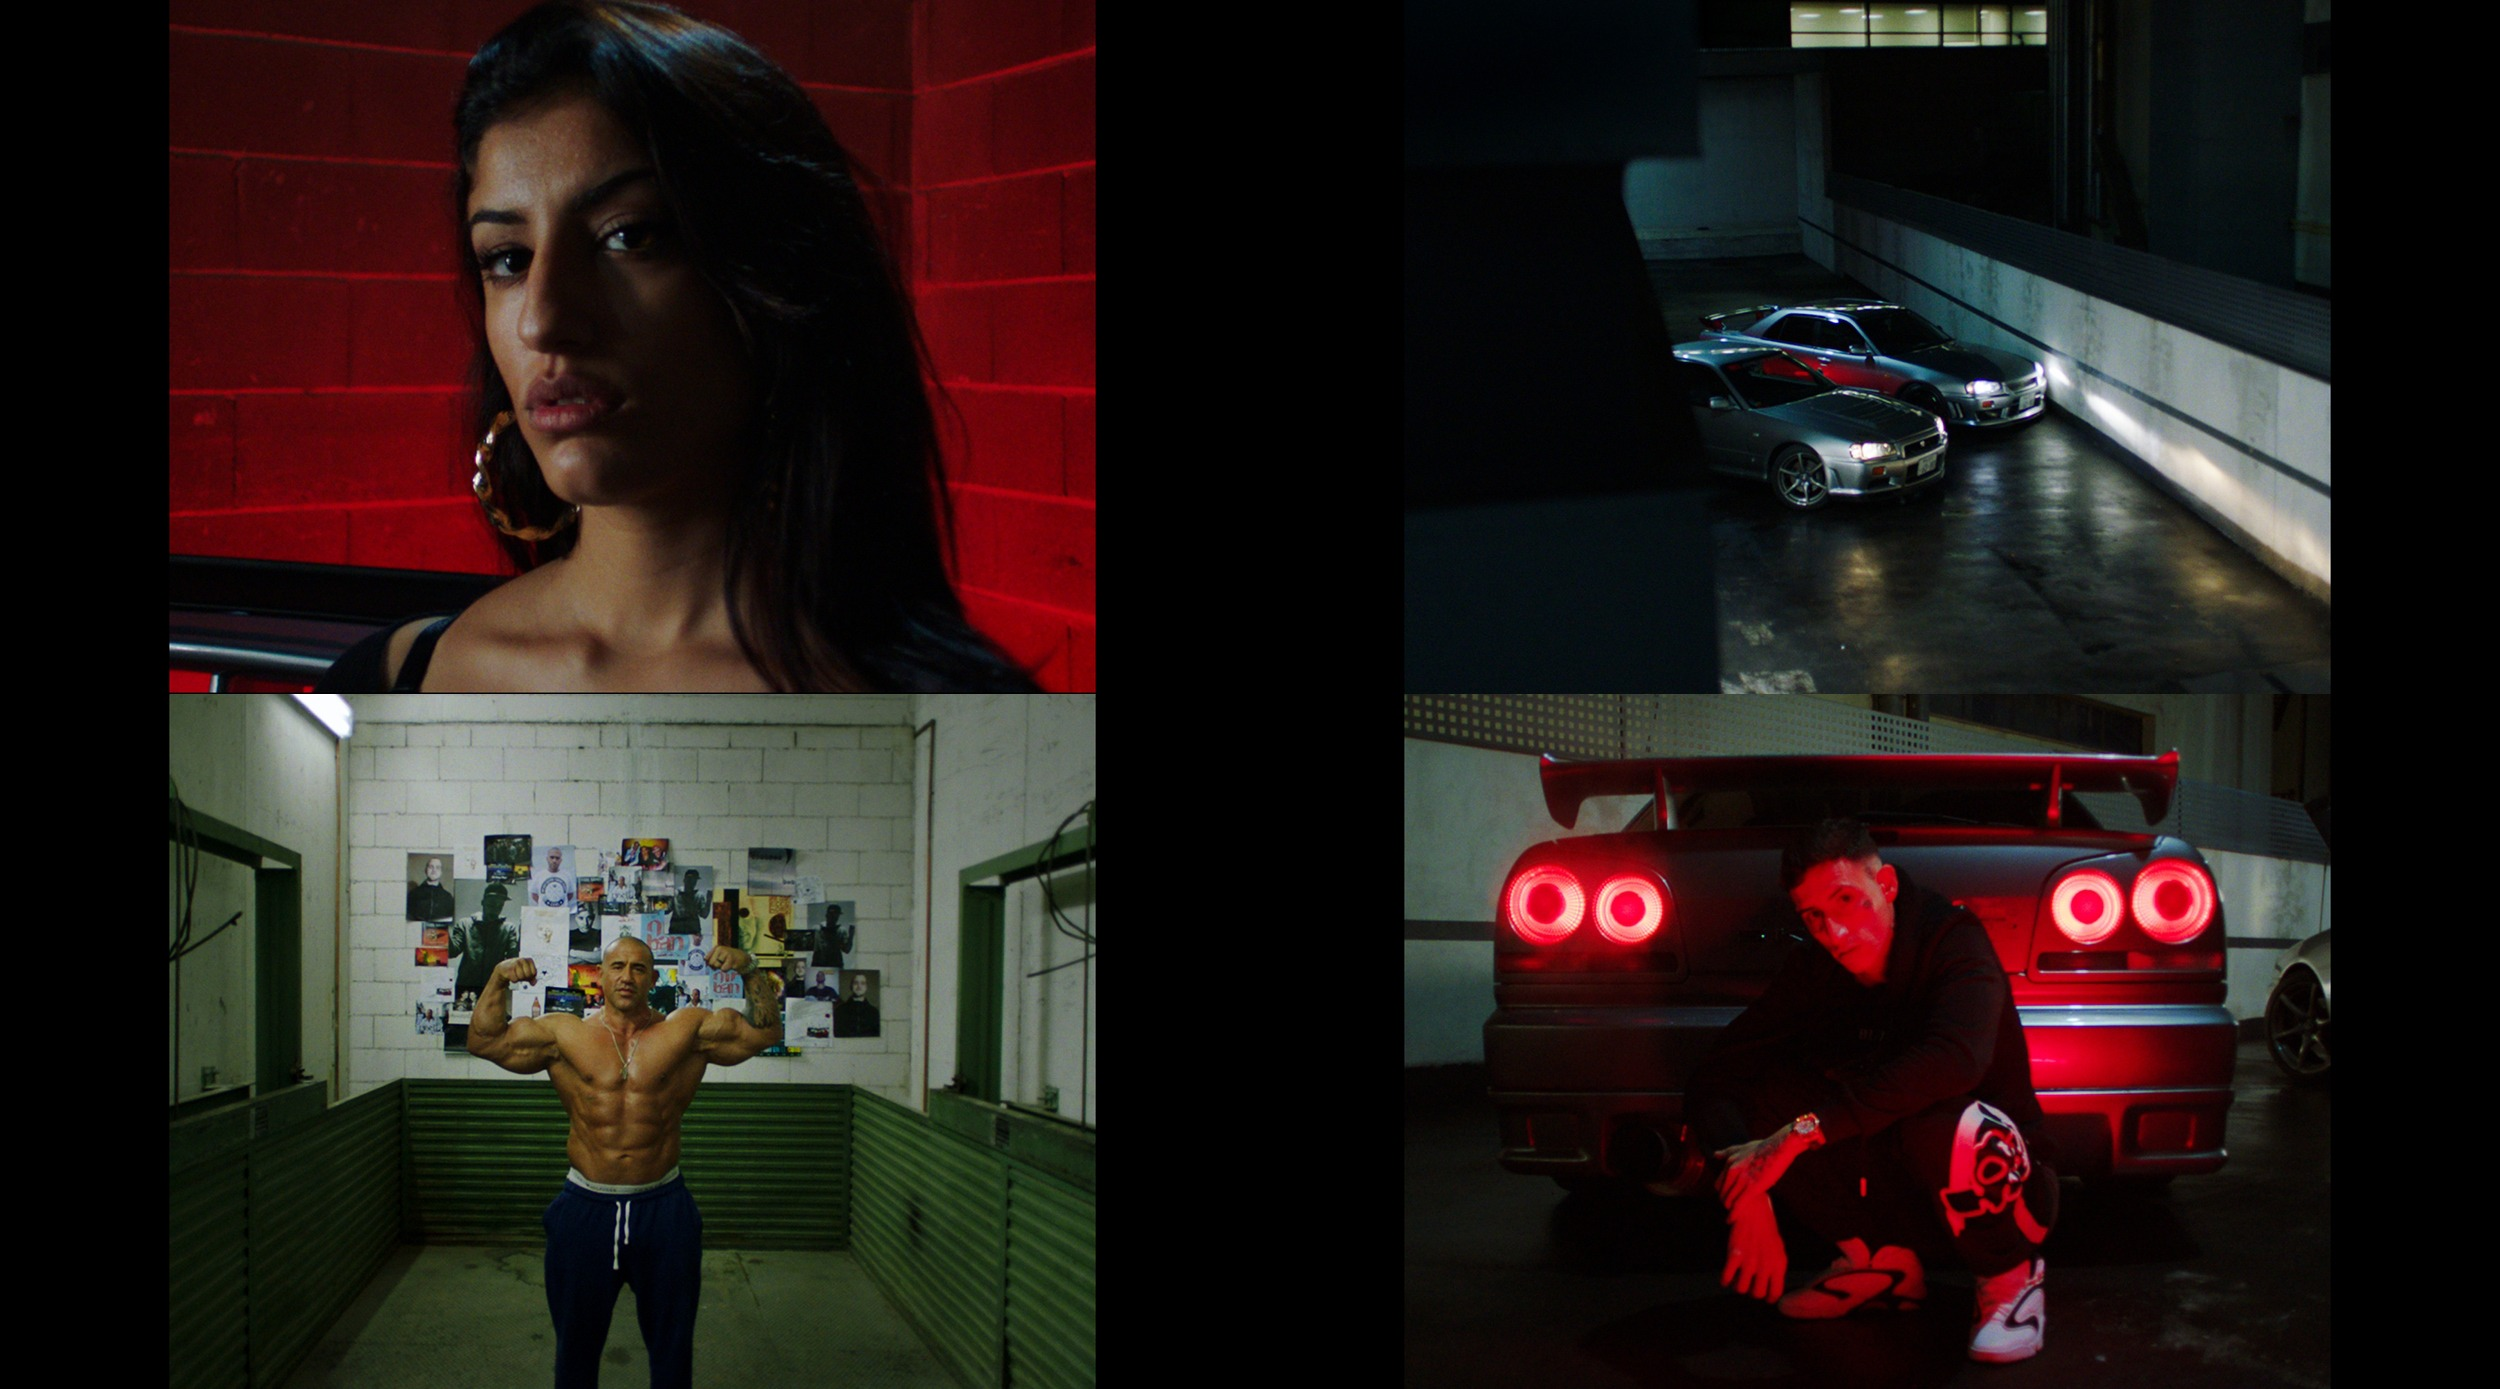 Proyecto-Vision-Tunel-AdrianRodd11